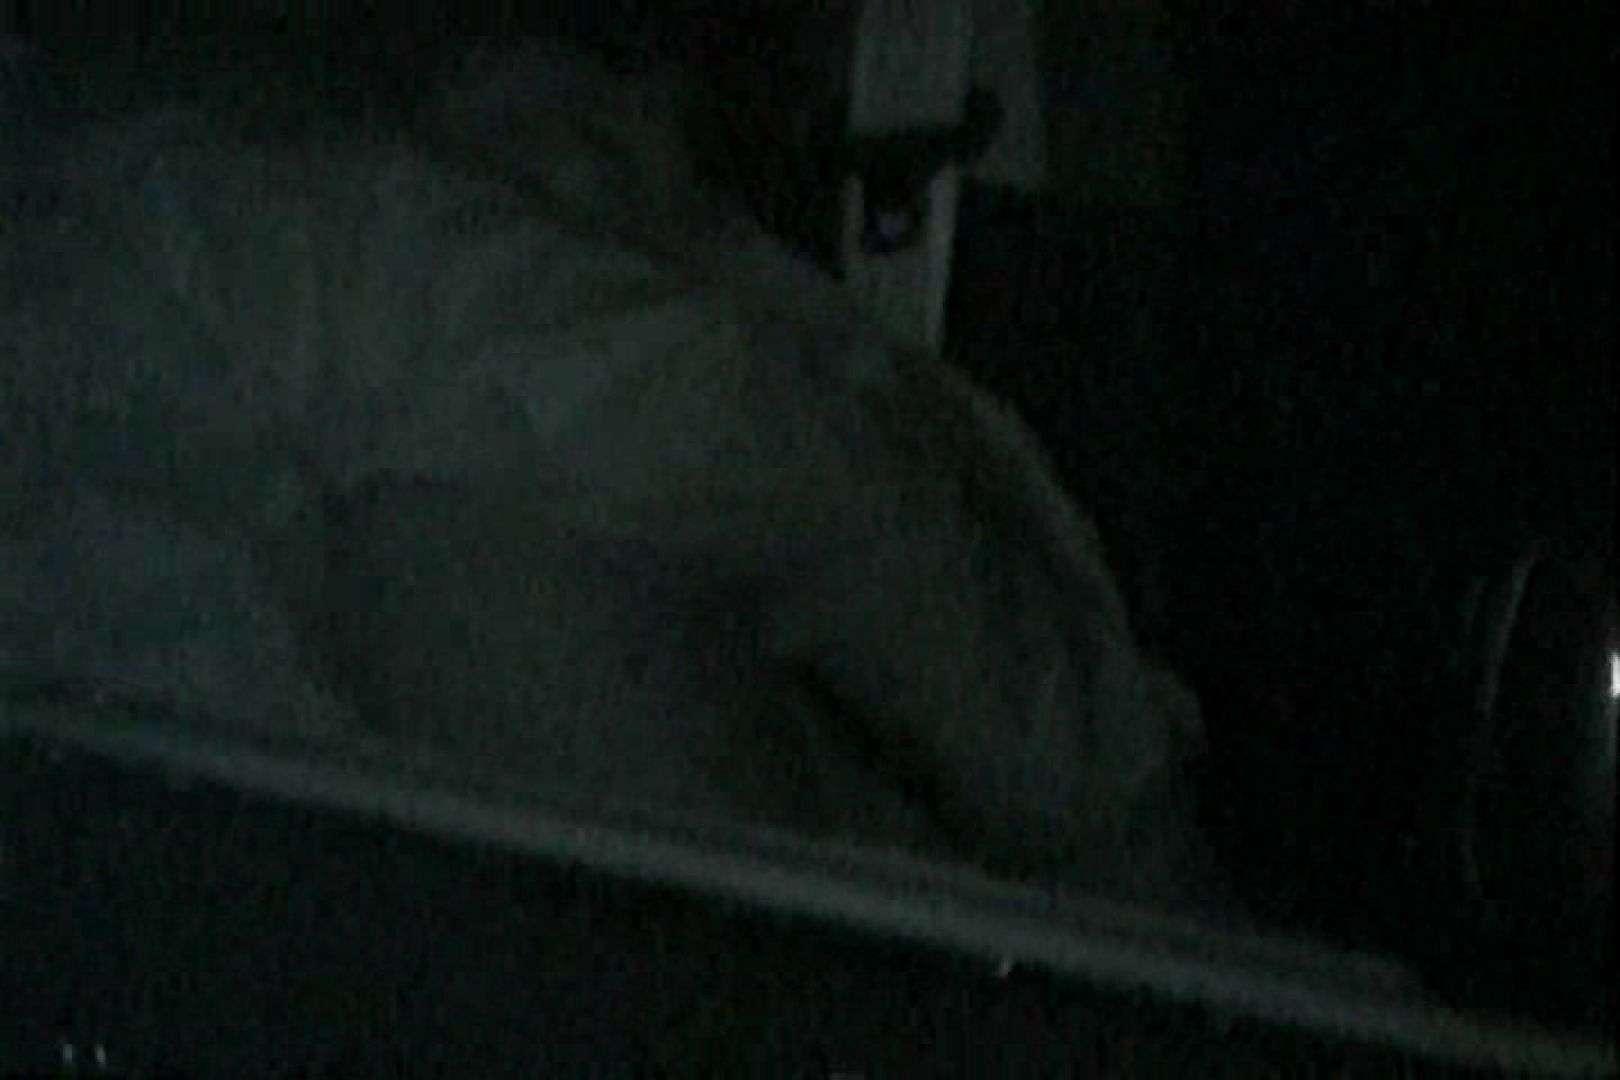 充血監督の深夜の運動会Vol.126 赤外線 エロ無料画像 107画像 98